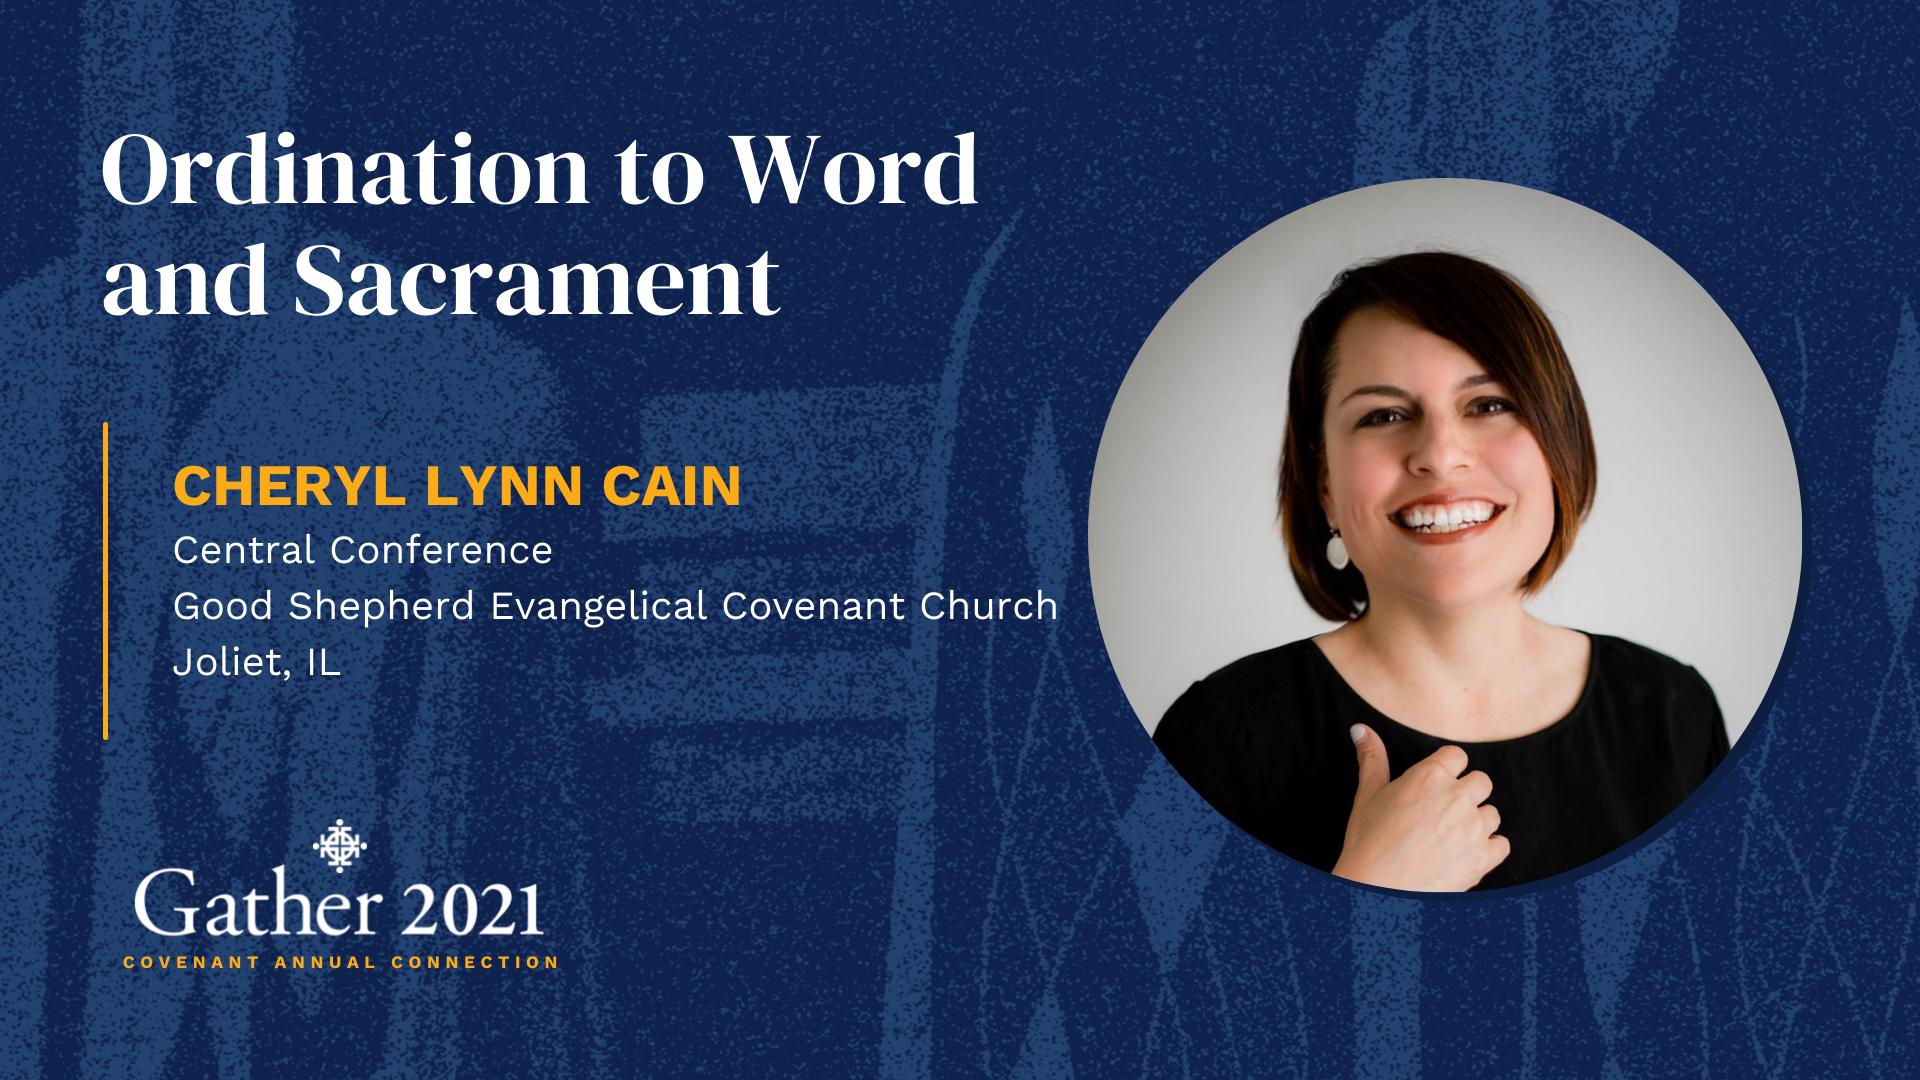 Cheryl Lynn Cain